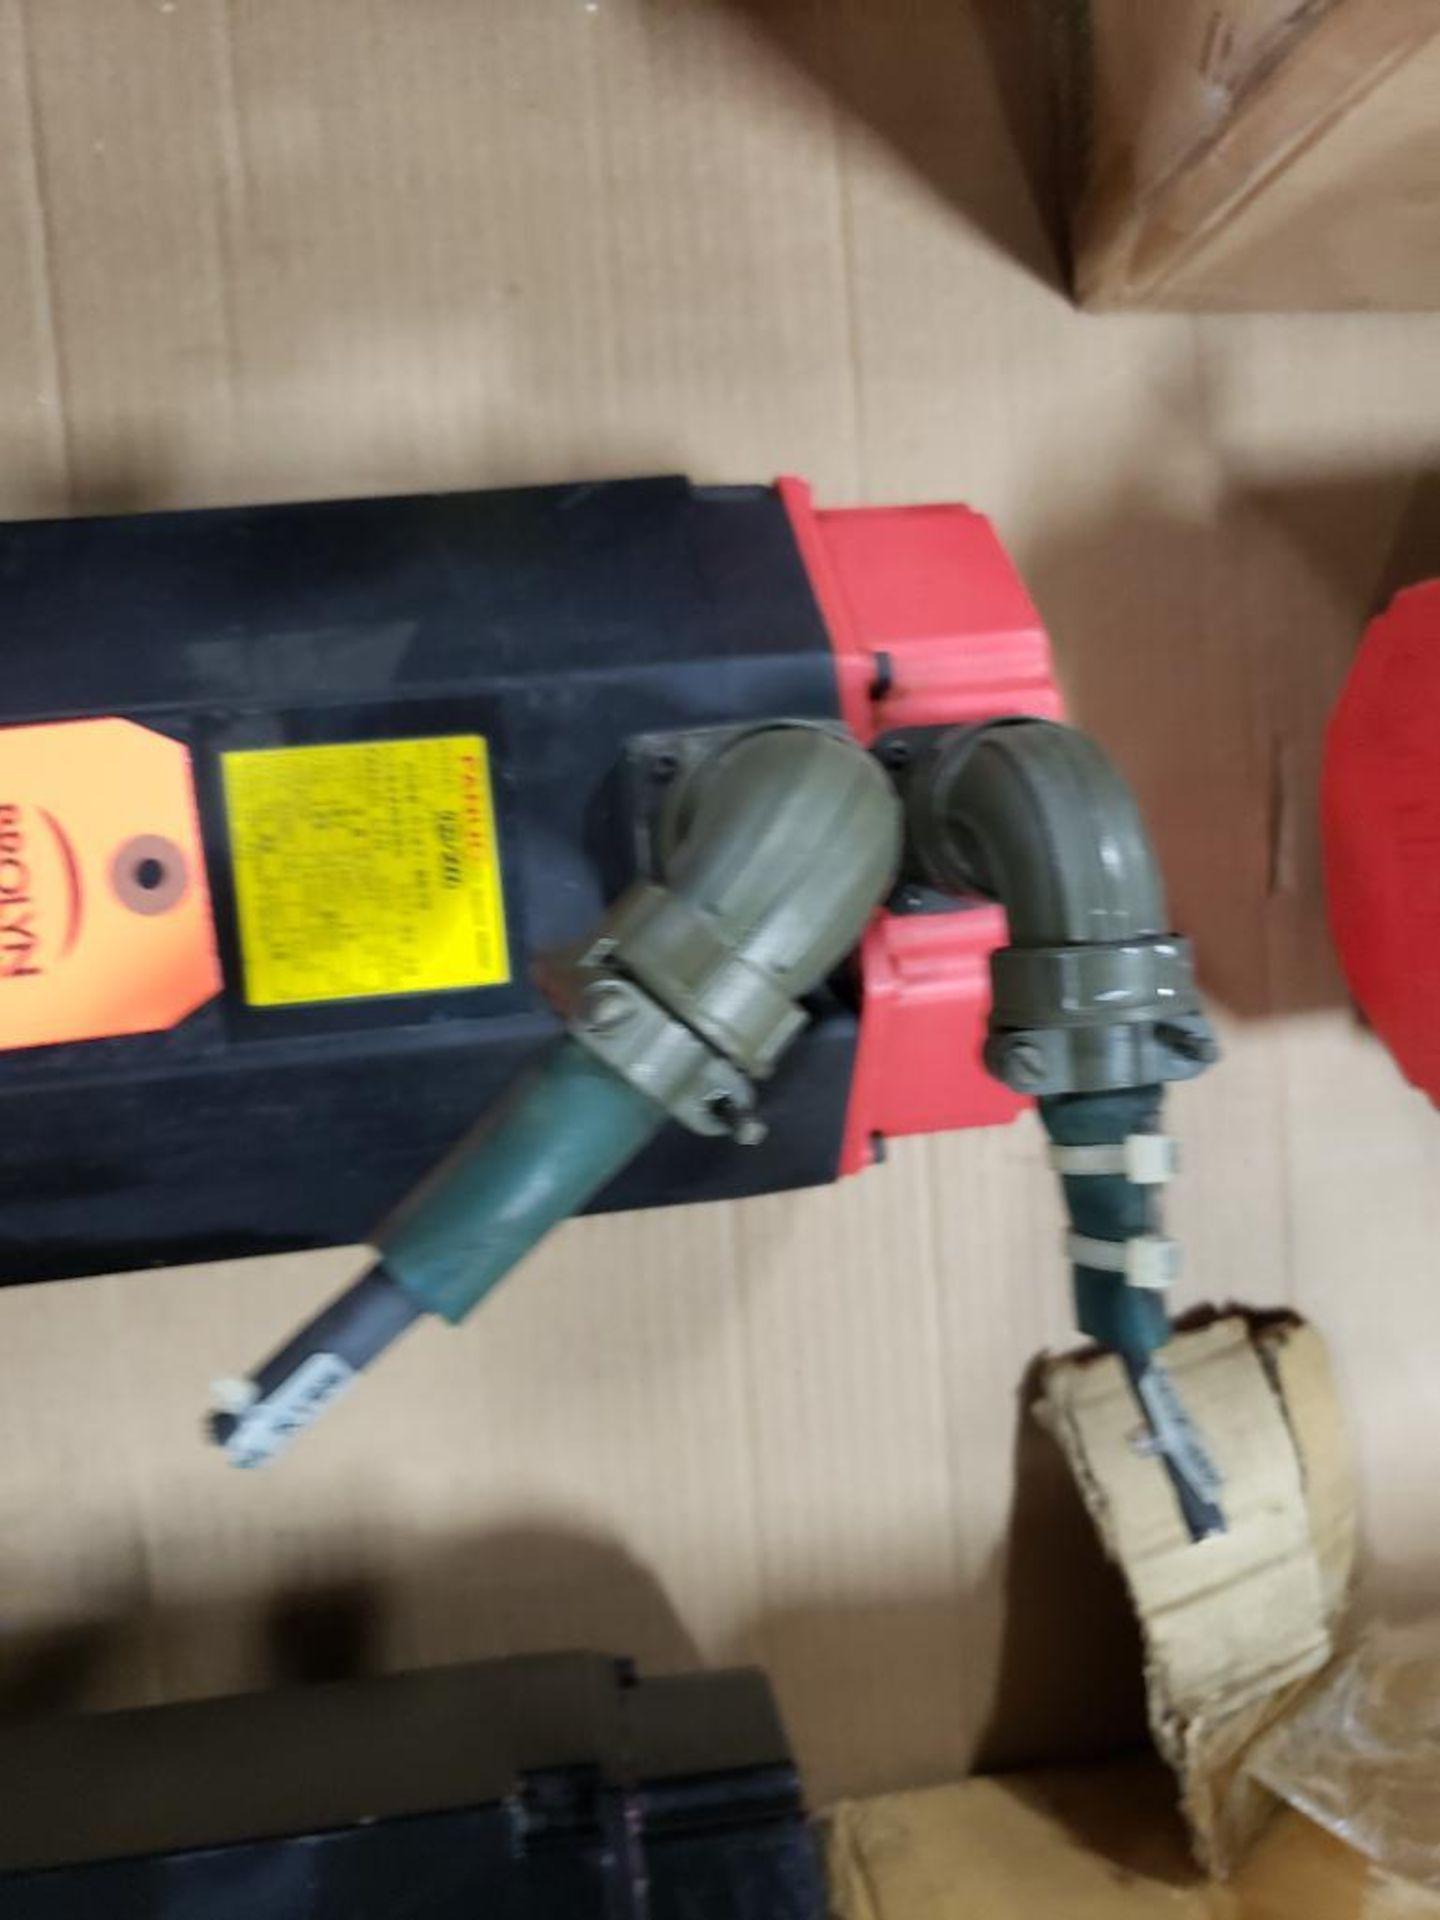 3.8kW GE Fanuc AC Servo Motor A06B-0147-B675. 157V, 2000RPM, 3PH. - Image 3 of 5